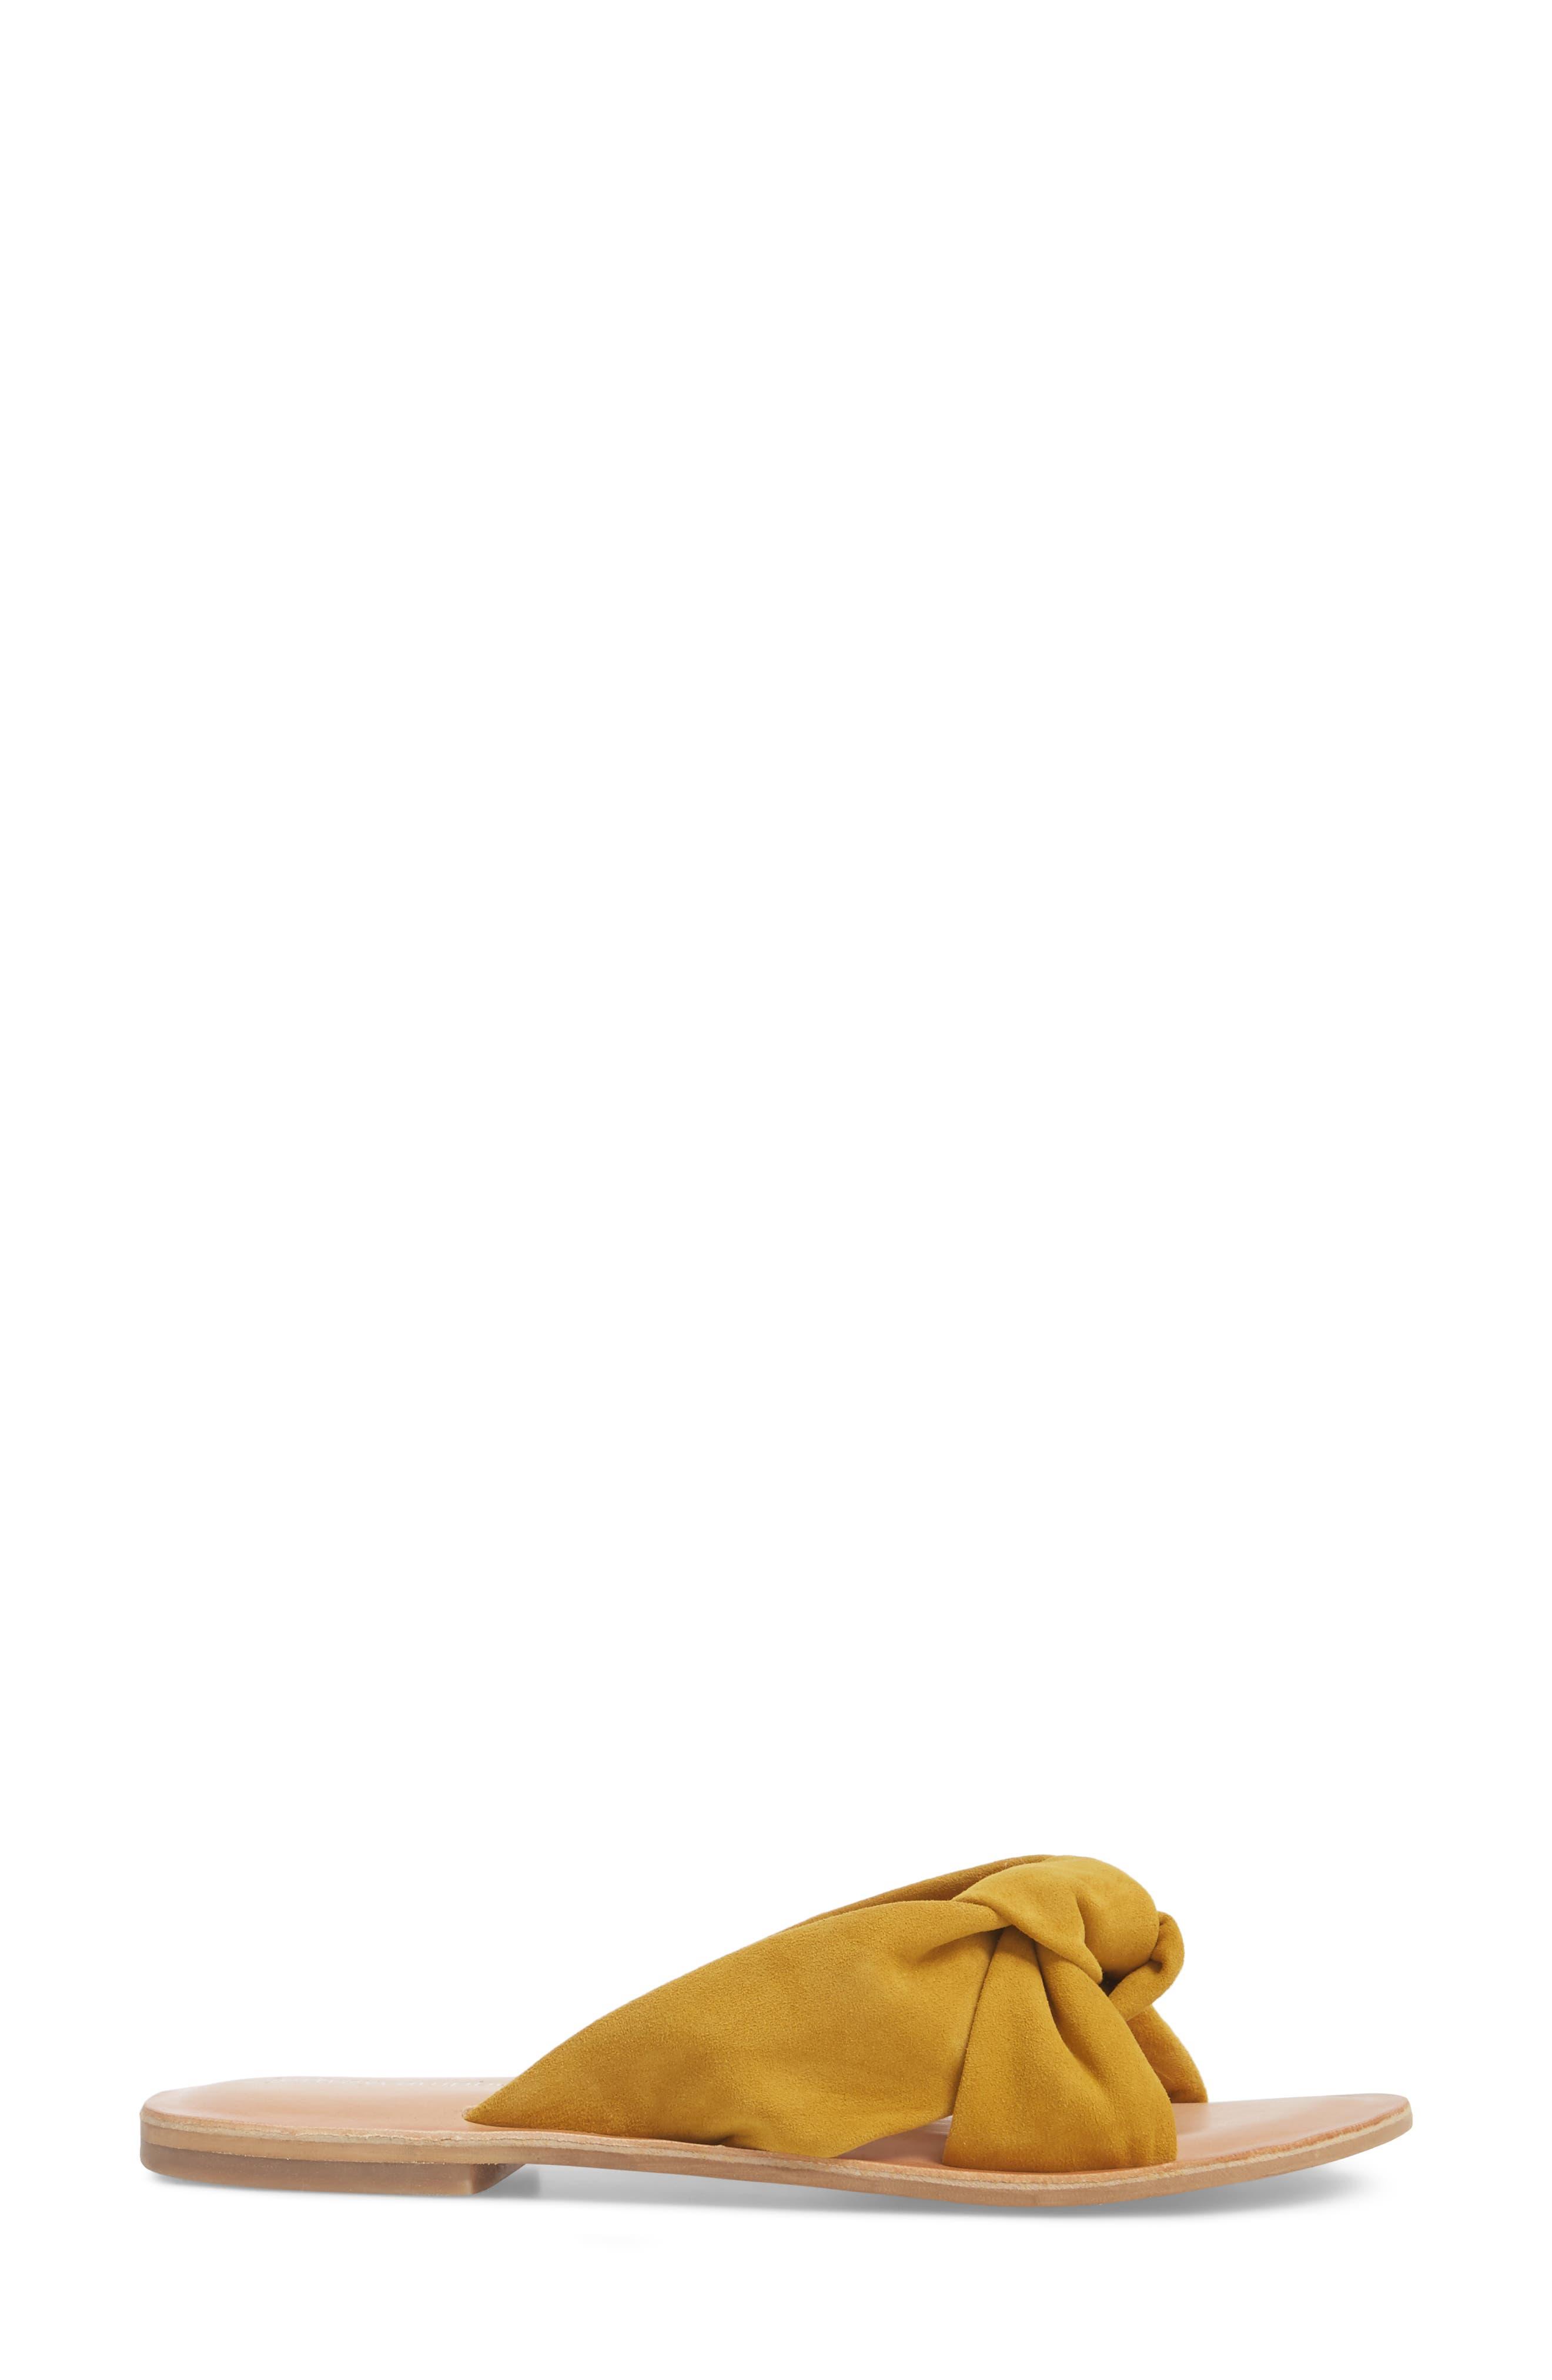 Zocalo Slide Sandal,                             Alternate thumbnail 3, color,                             Mustard Suede